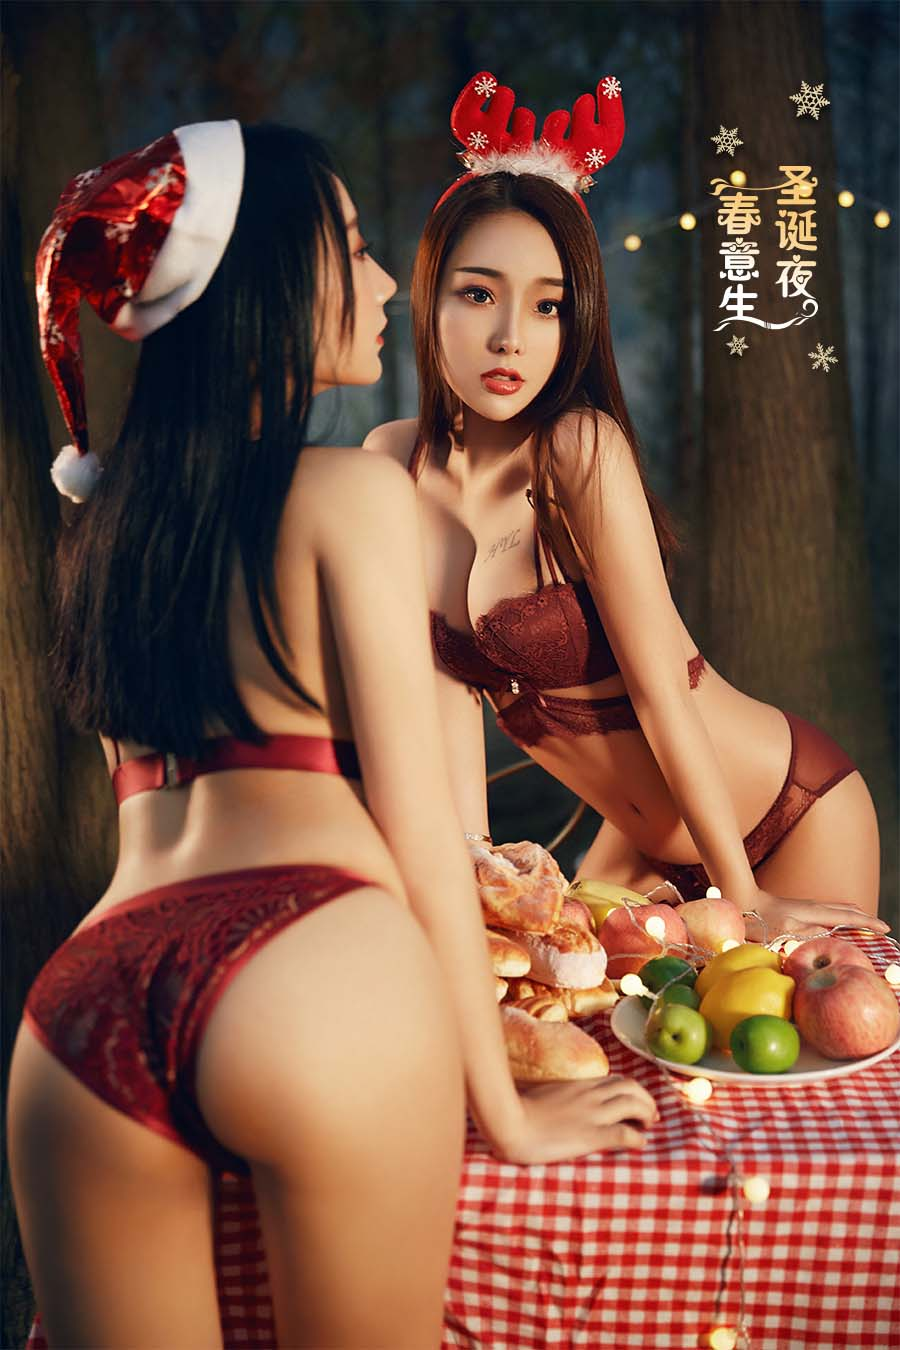 [YouMi尤蜜]2018.12.25 圣诞夜 春意生 尤蜜合辑[/28.2MB]